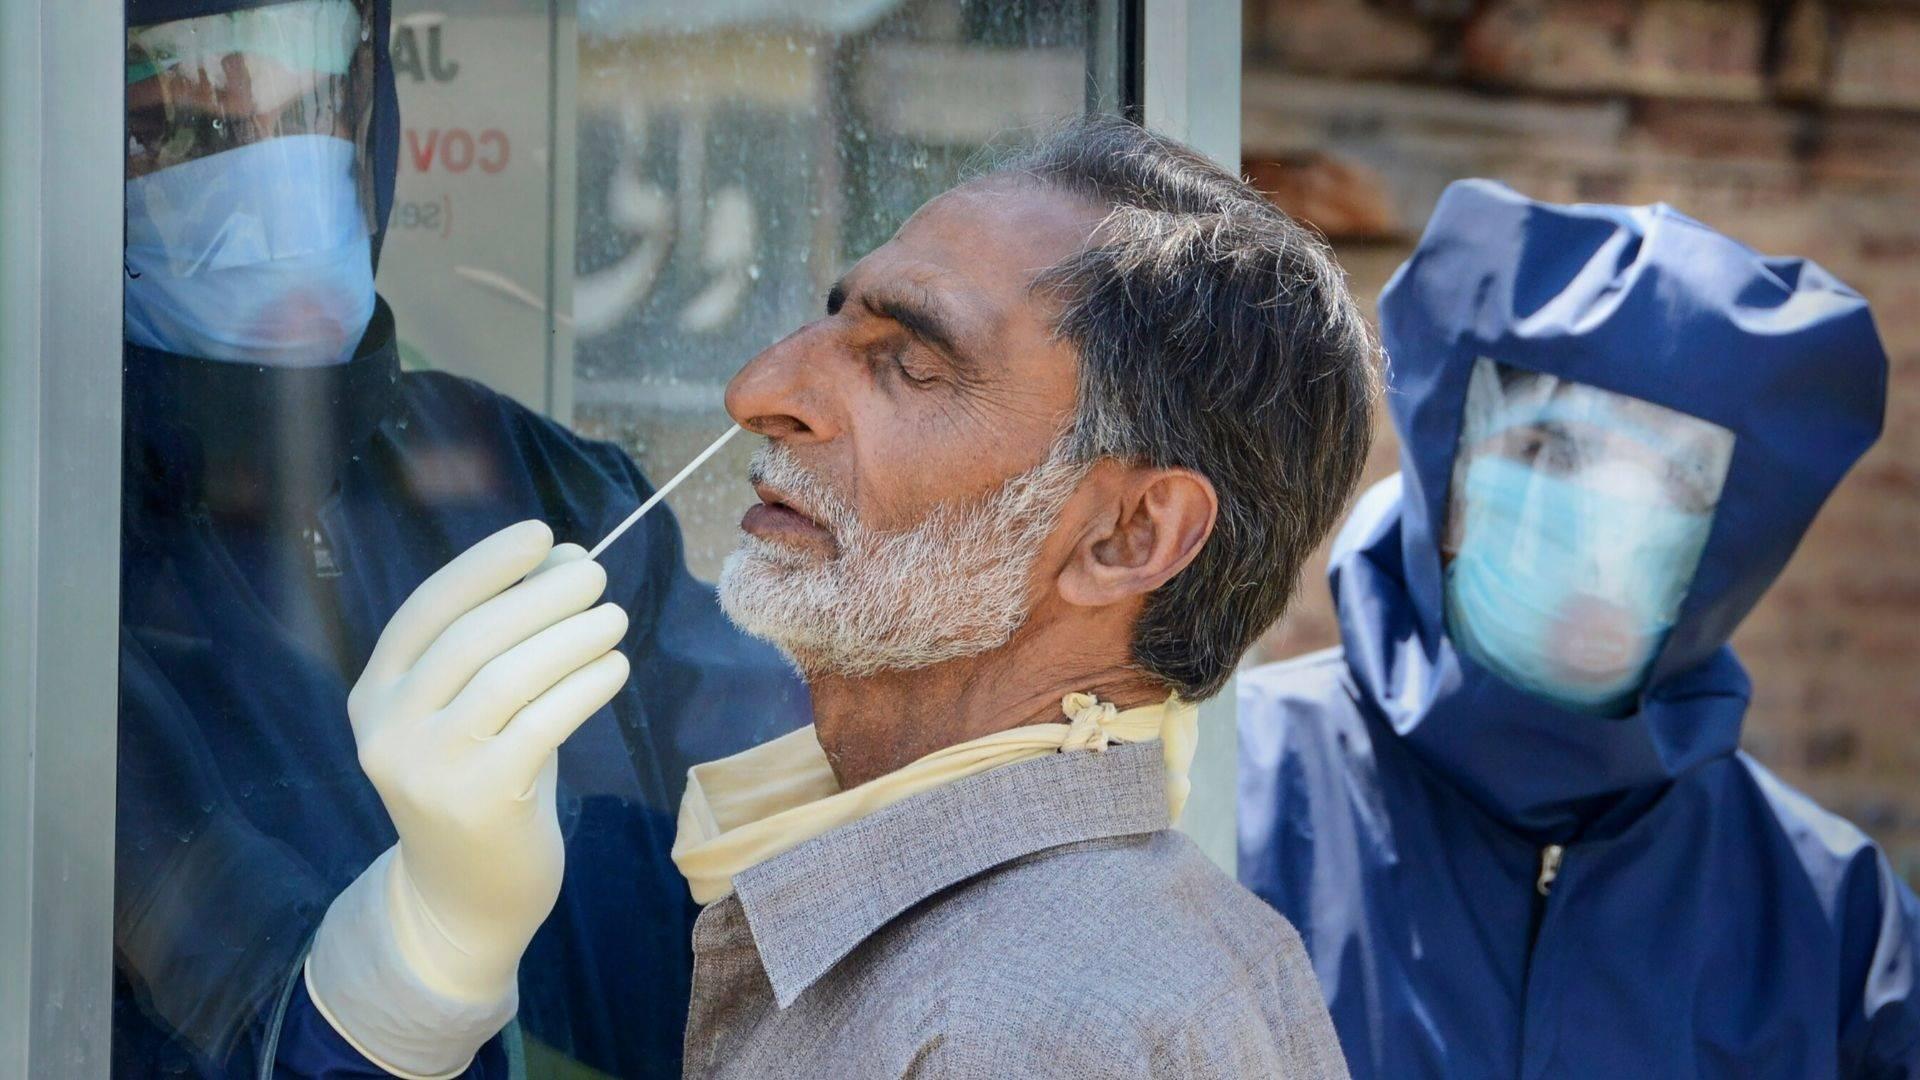 Top News: 62 Coronavirus patients died in the last 24 hours